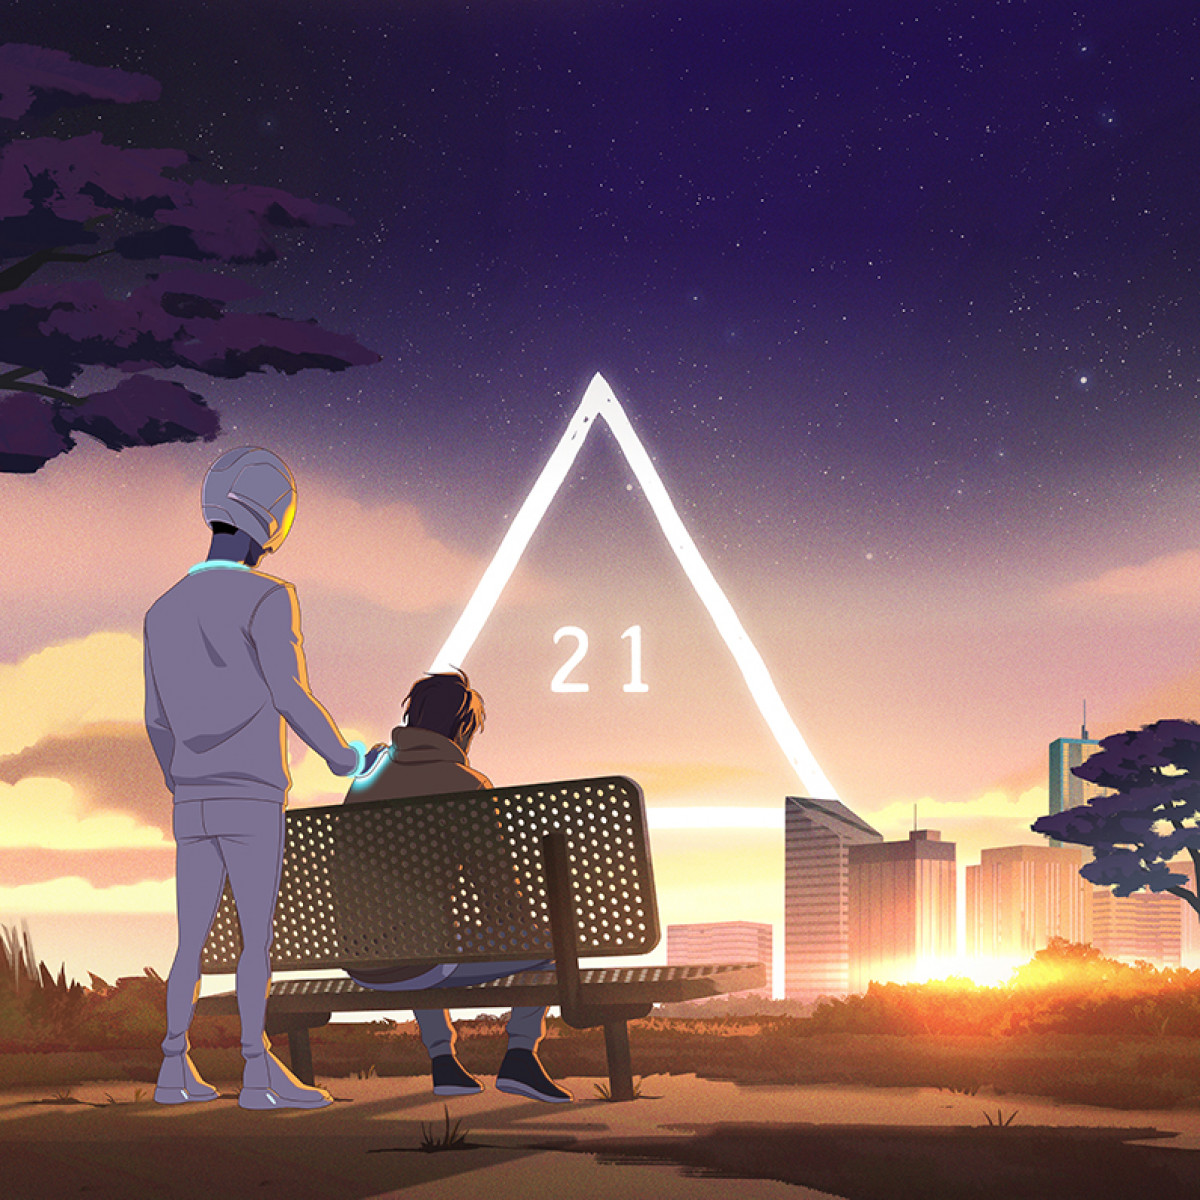 Cover Area21, Martin Garrix, Maejor - Lovin' Every Minute